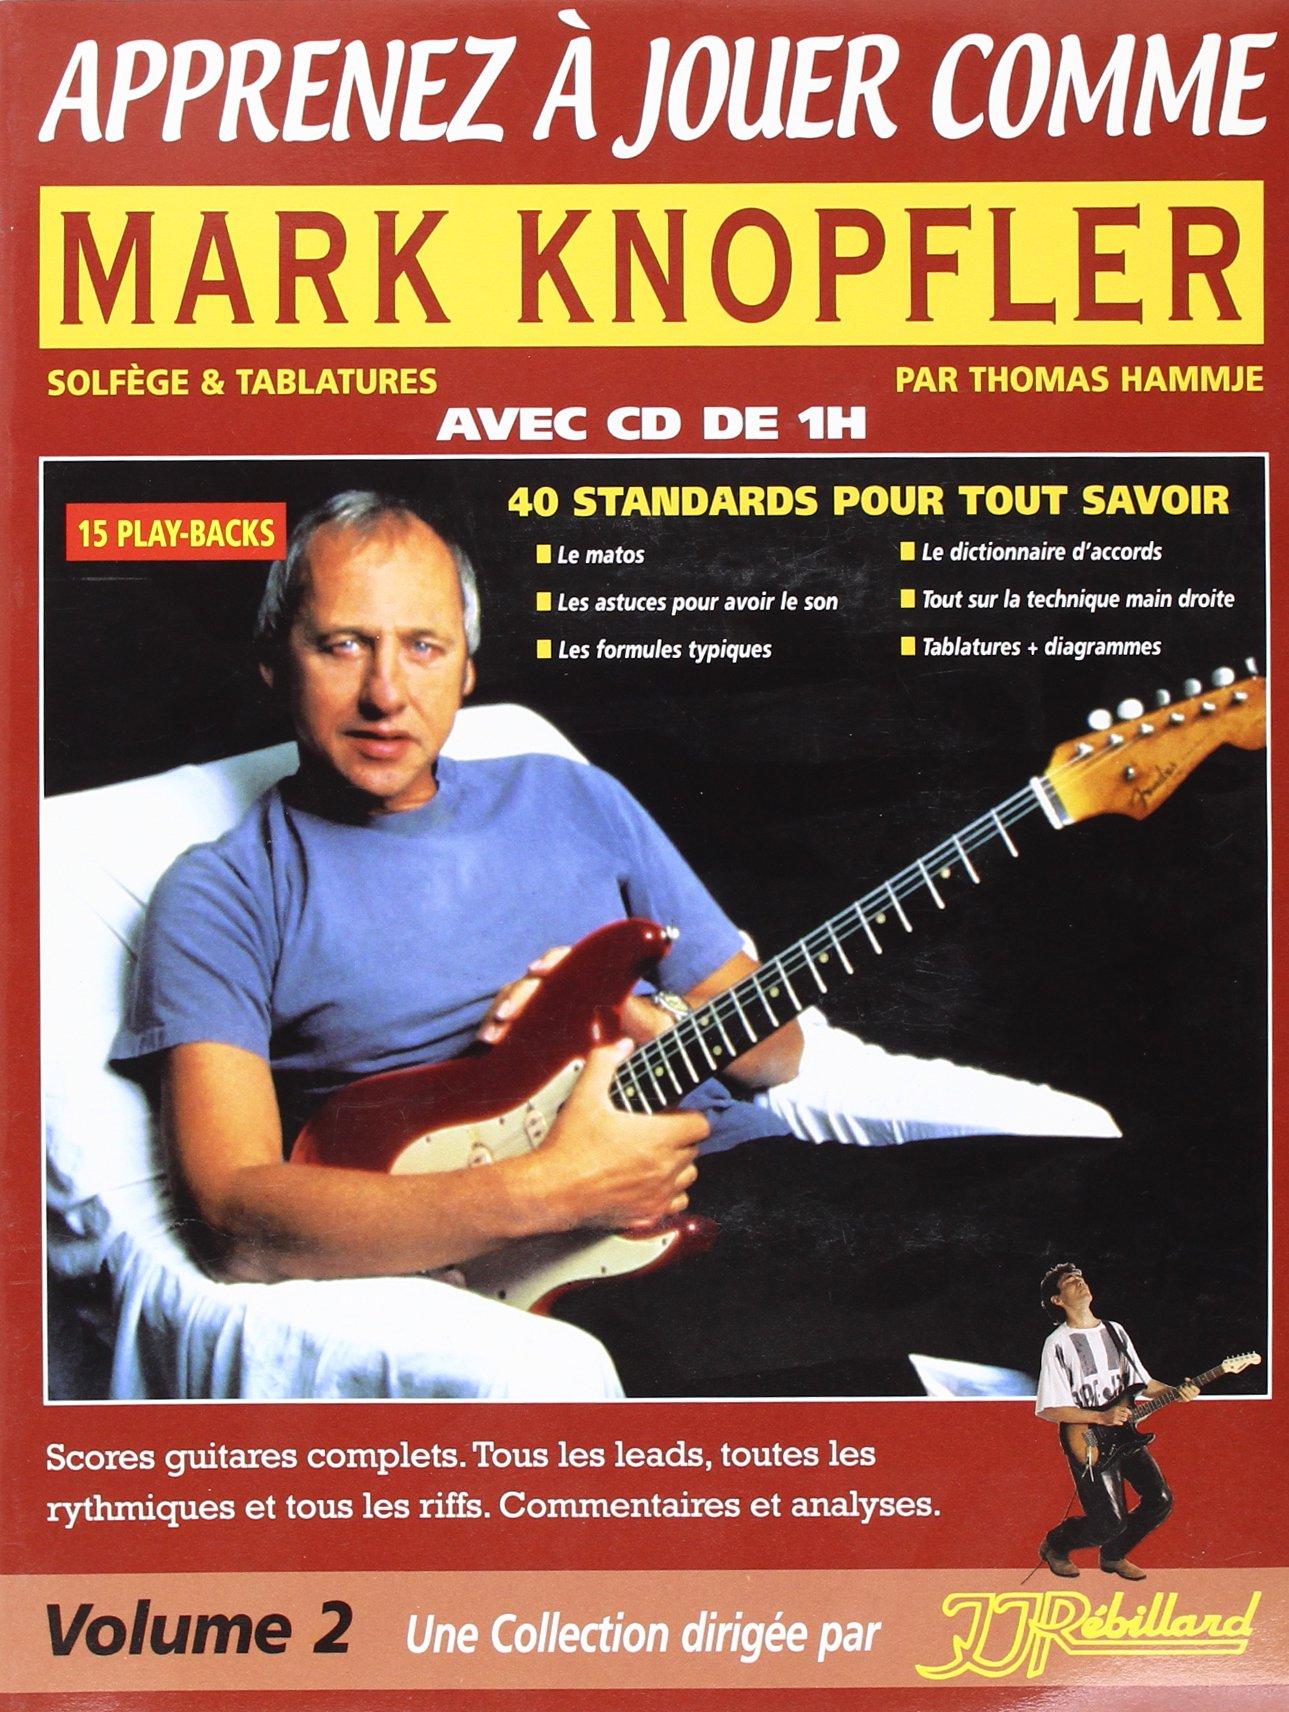 Thomas Hammje: Apprenez A Jouer Comme Mark Knopfler: Electric Guitar: